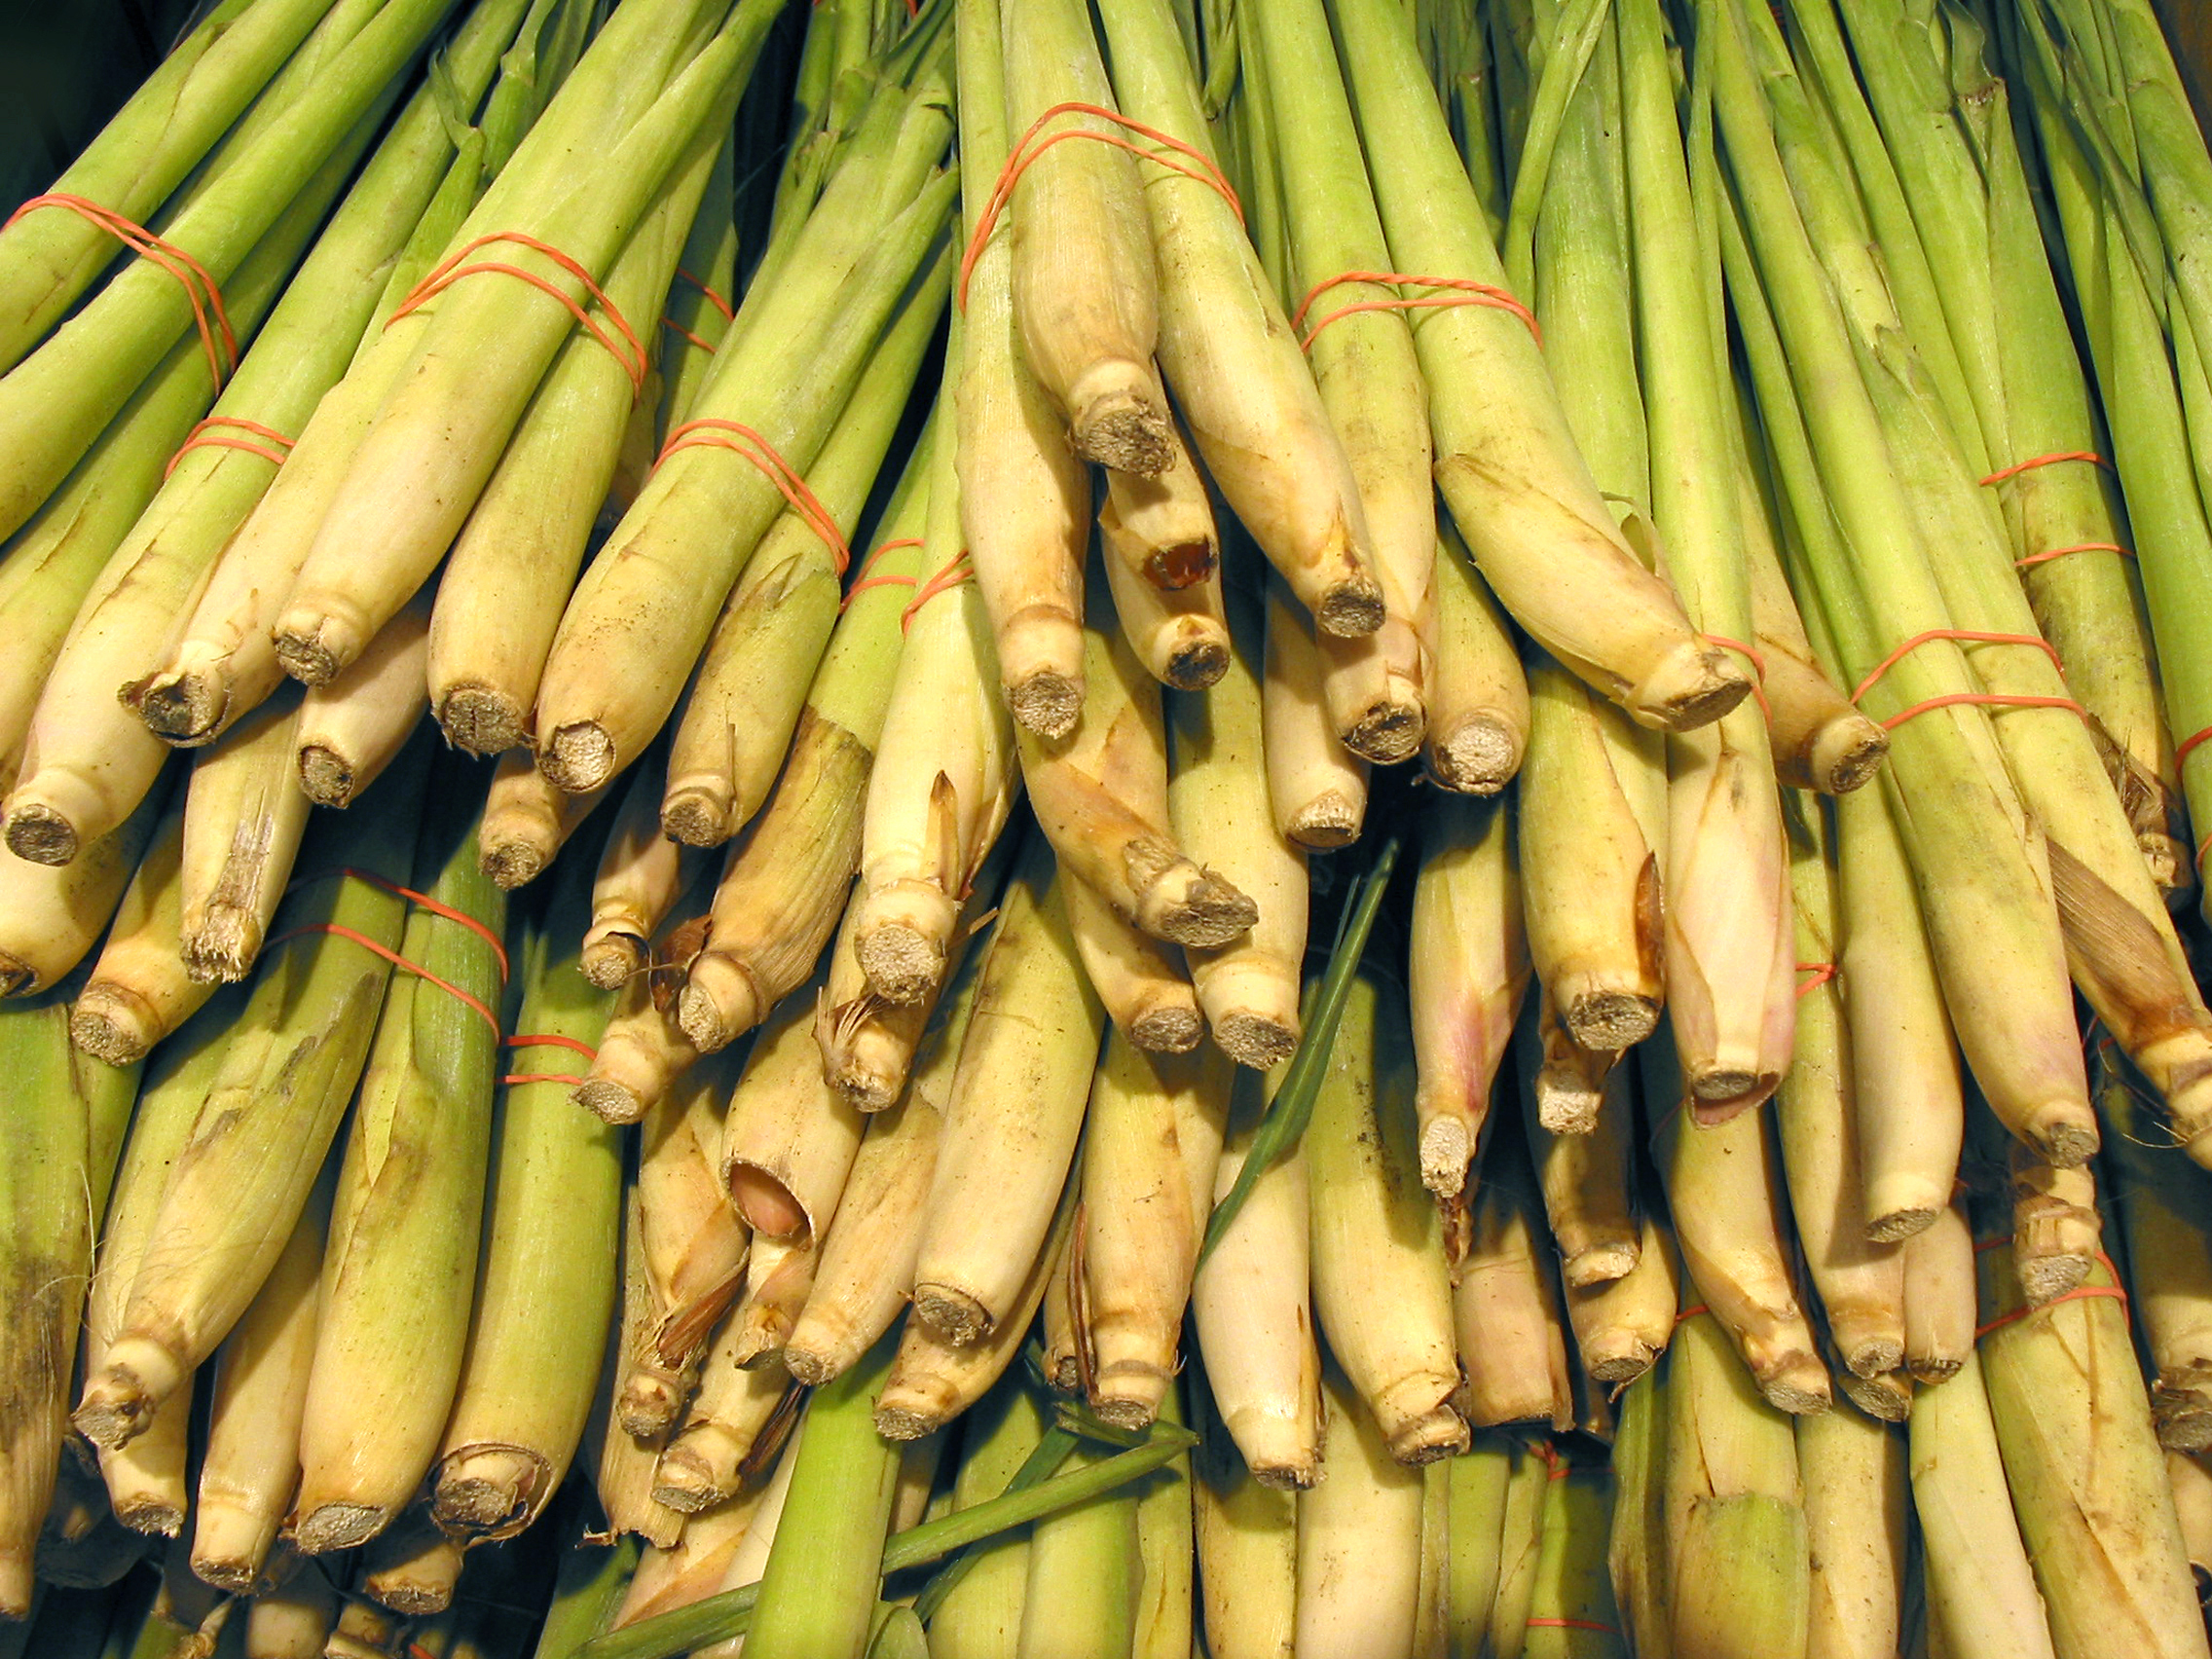 lemongrass free stock photo image picture lemongrass asian